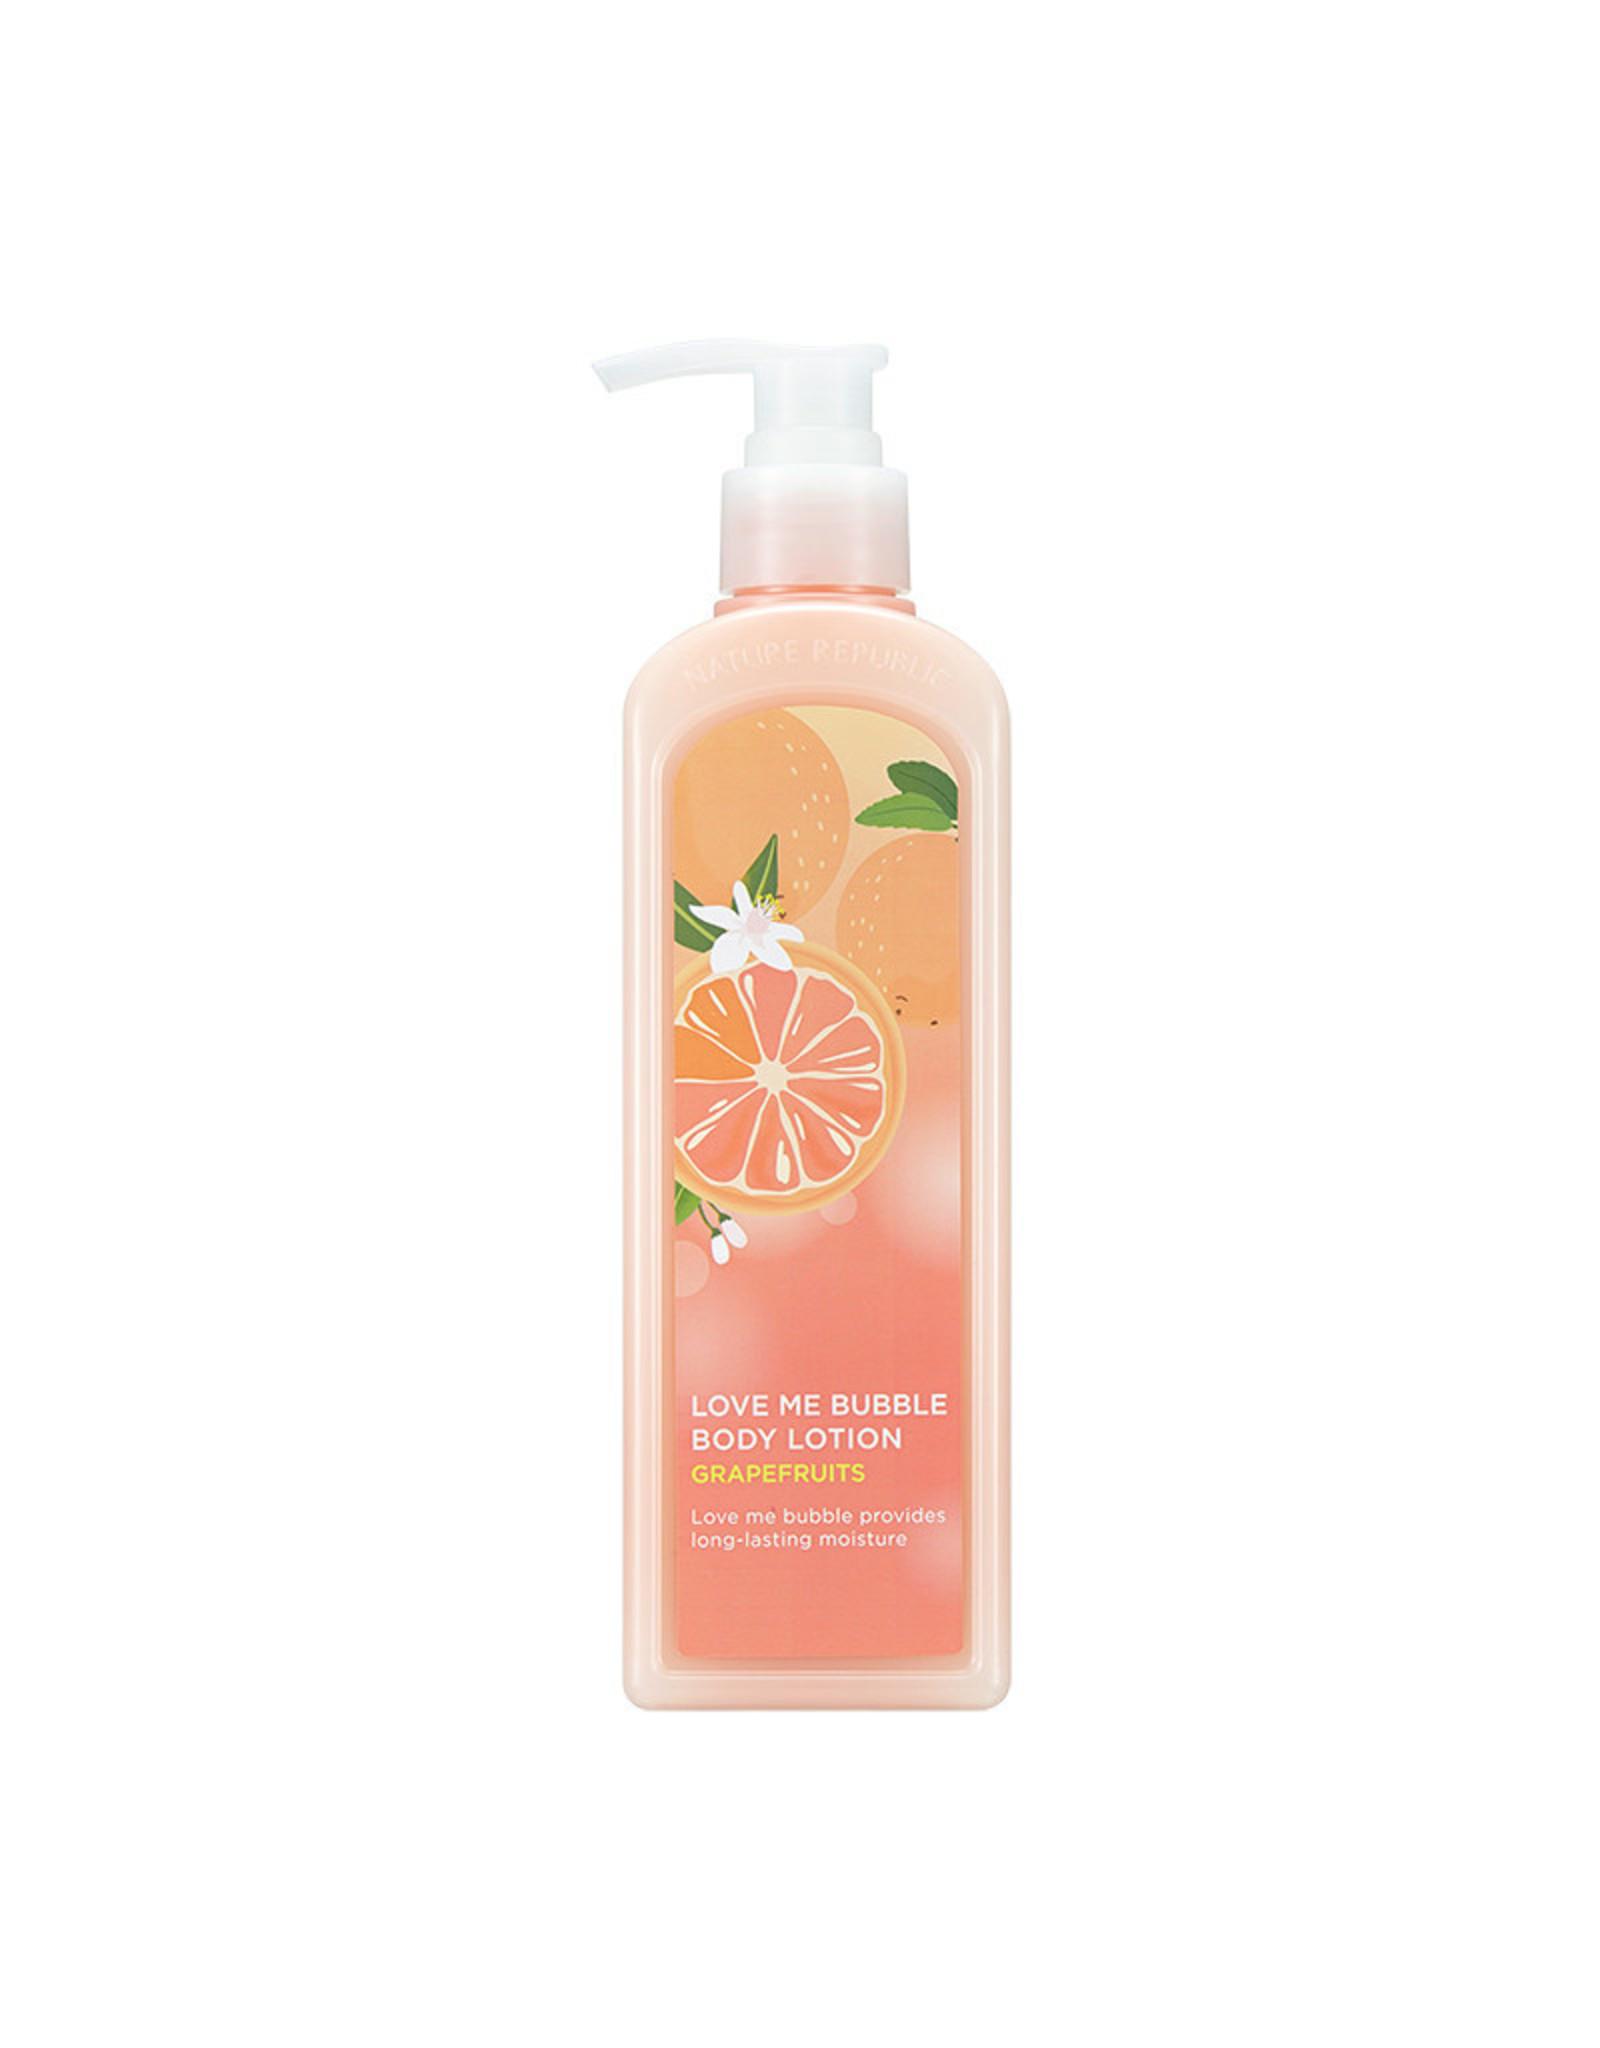 Love Me Bubble Body Lotion-Grapefruits (Orig $22.90)